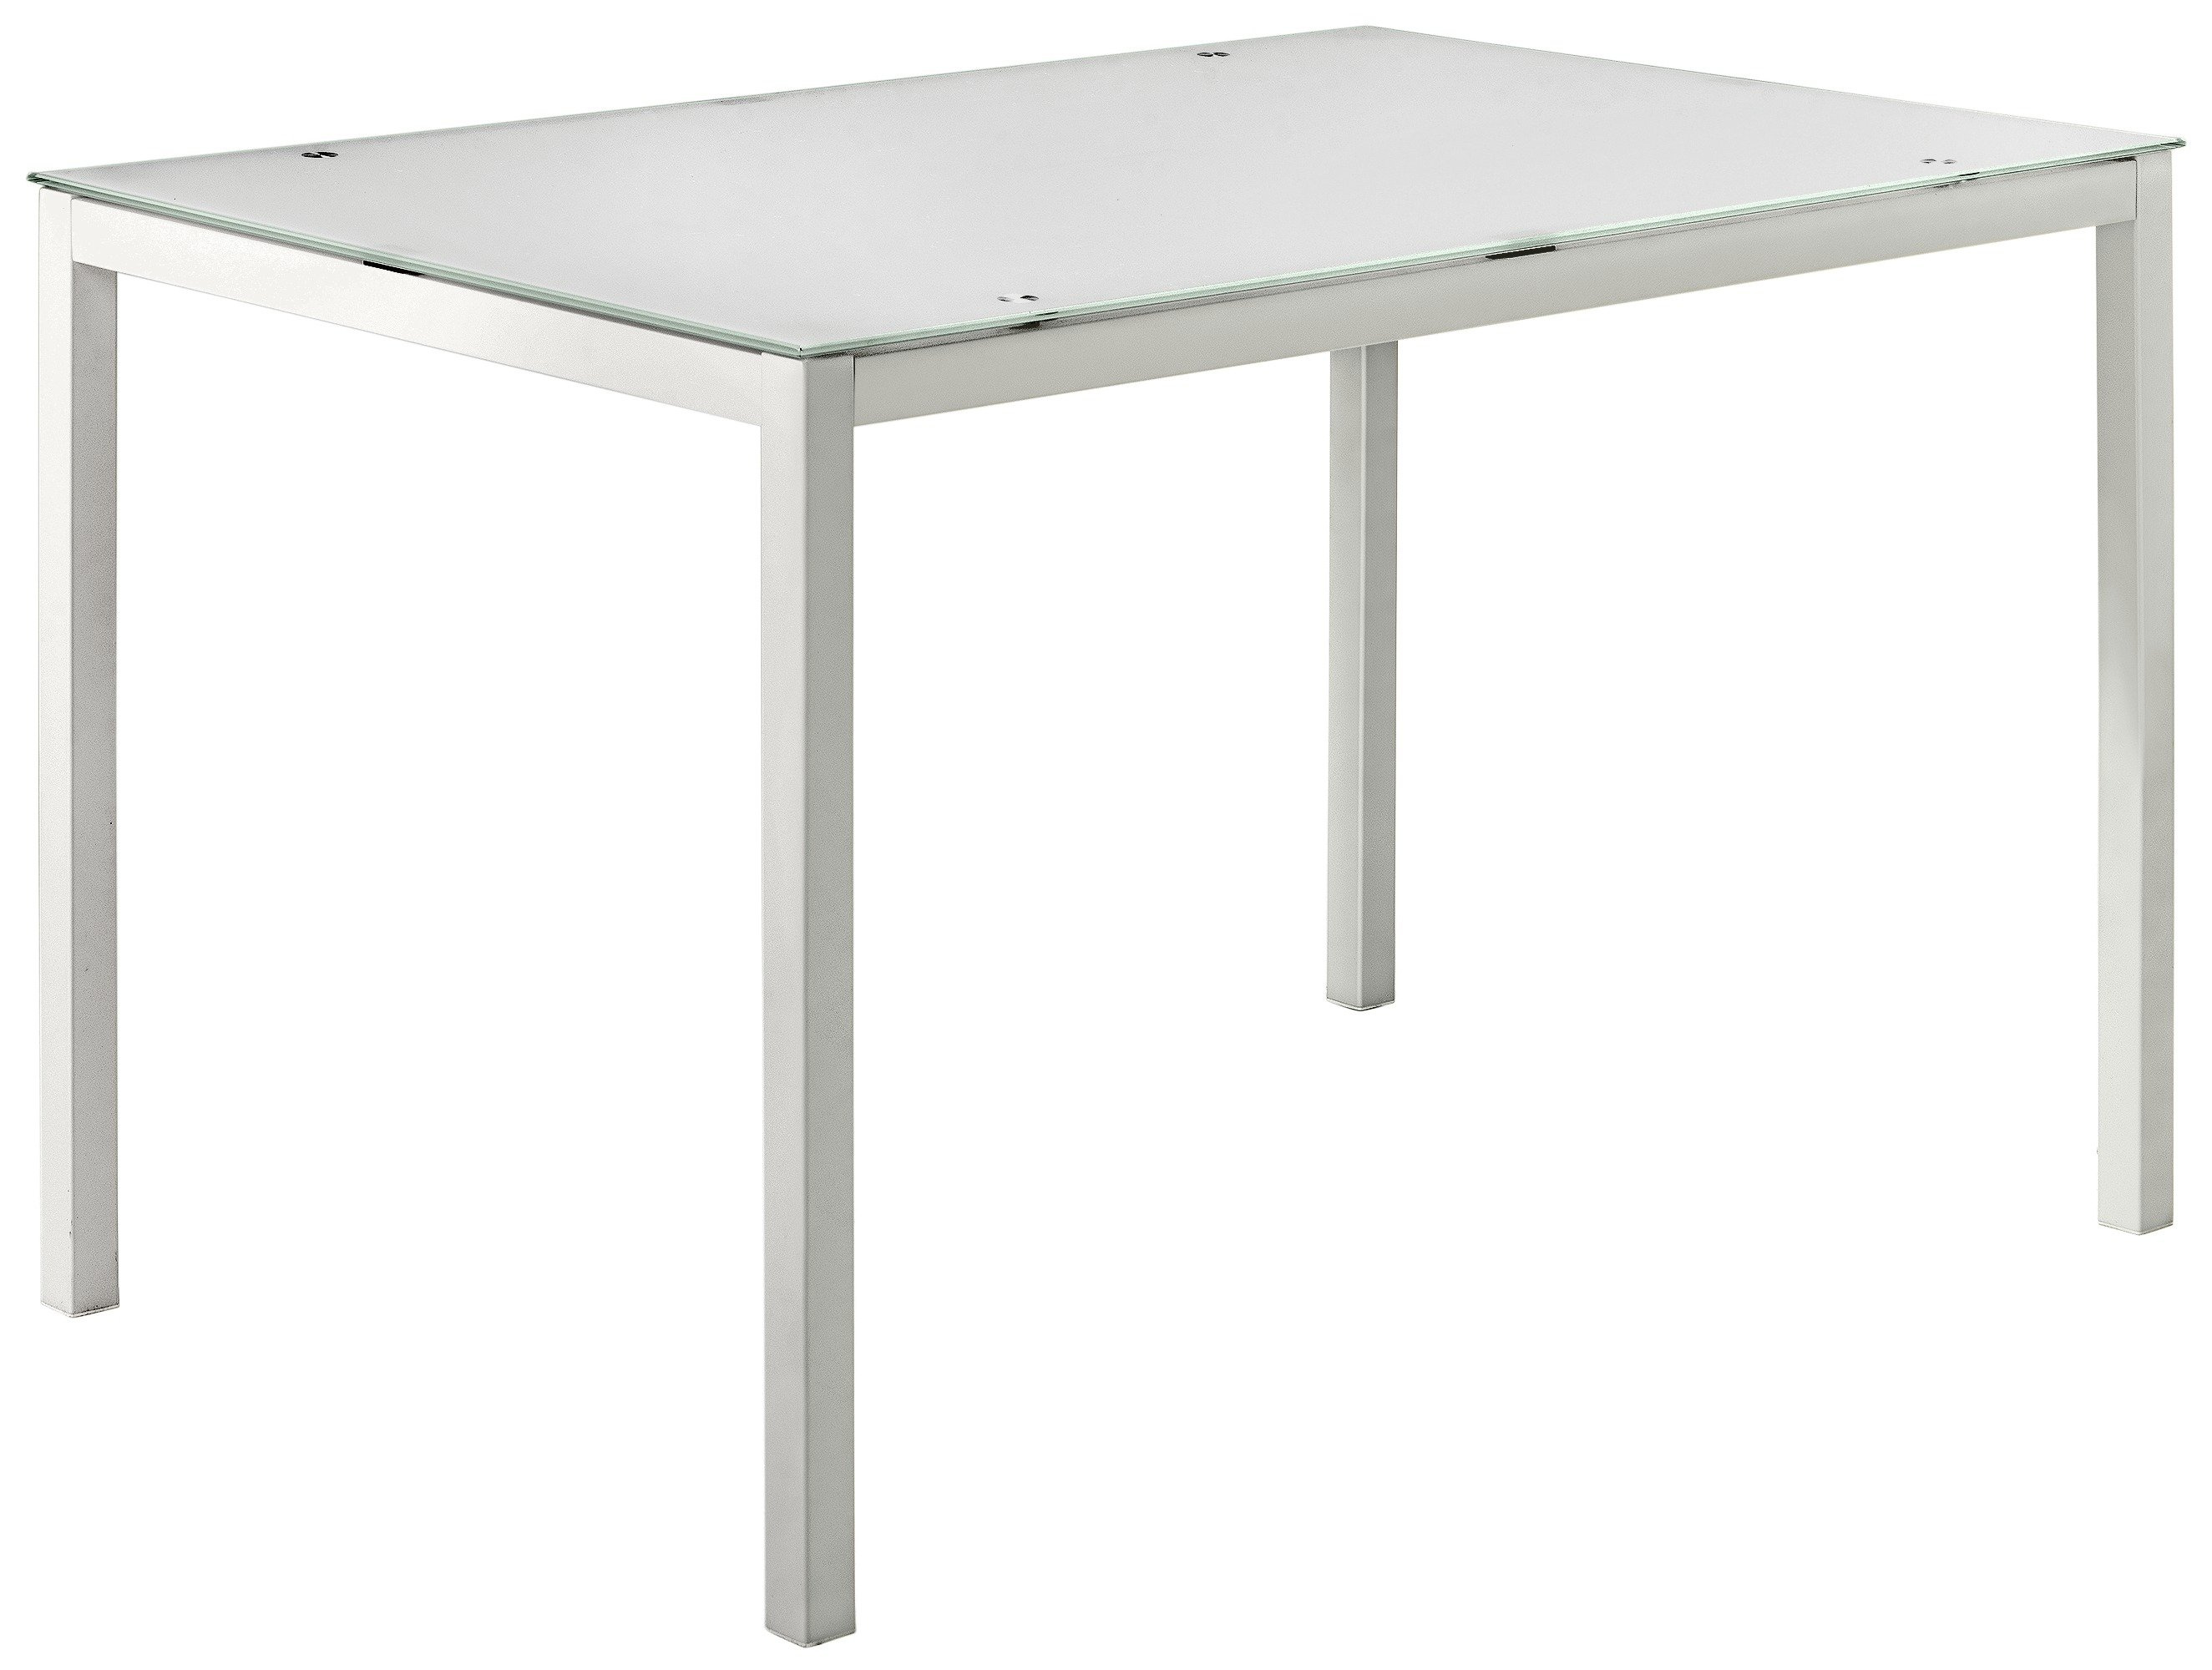 Buy Hygena Lido Glass Dining Table amp 4 Chairs White at  : 4876821RZ002AWebampw570amph513 from www.argos.co.uk size 570 x 513 jpeg 11kB